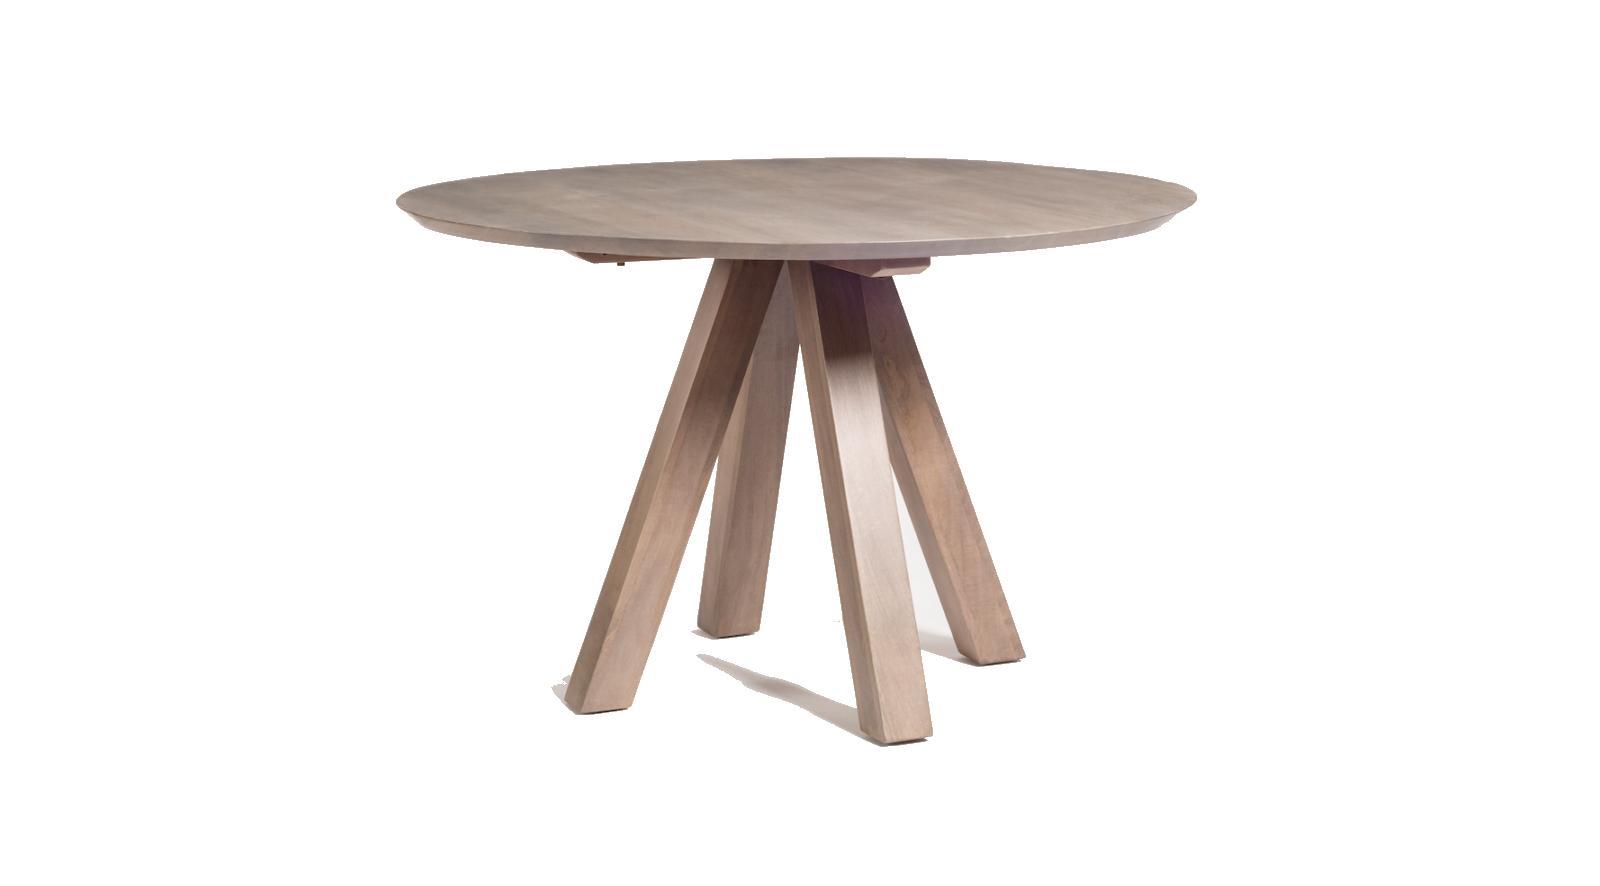 Trenton Dining Table